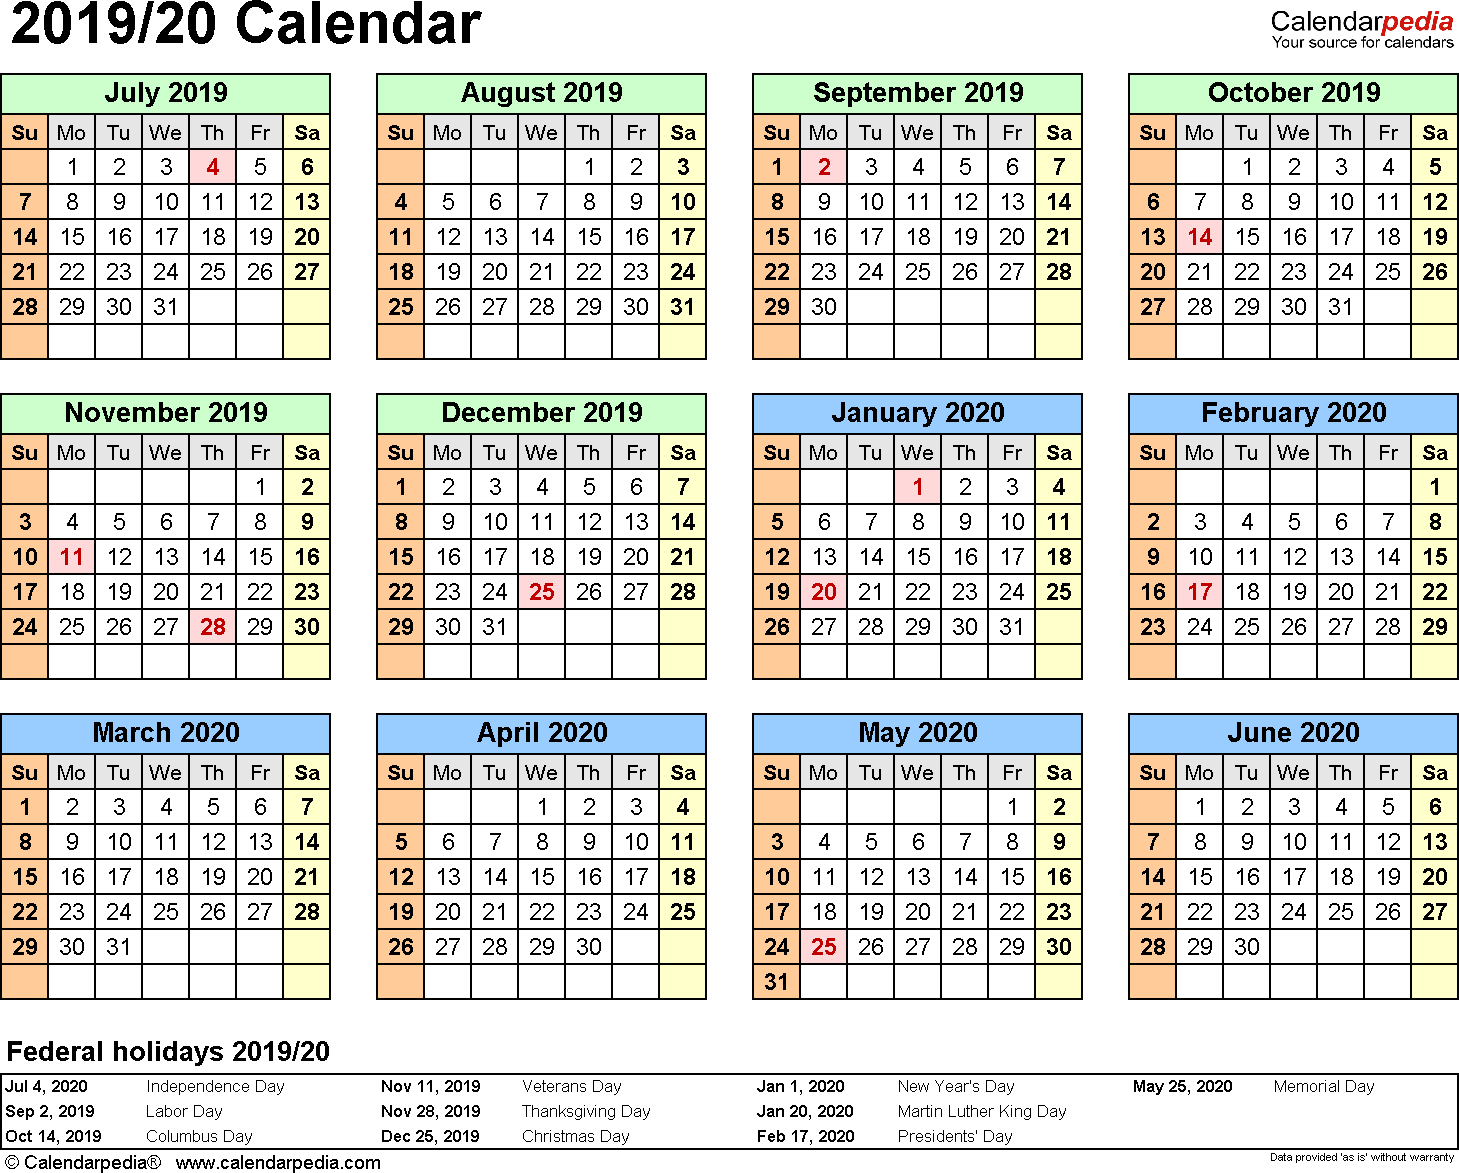 Split Year Calendar 2019/20 (July To June) - Pdf Templates in June 2019-June 2020 Yearly Calendar